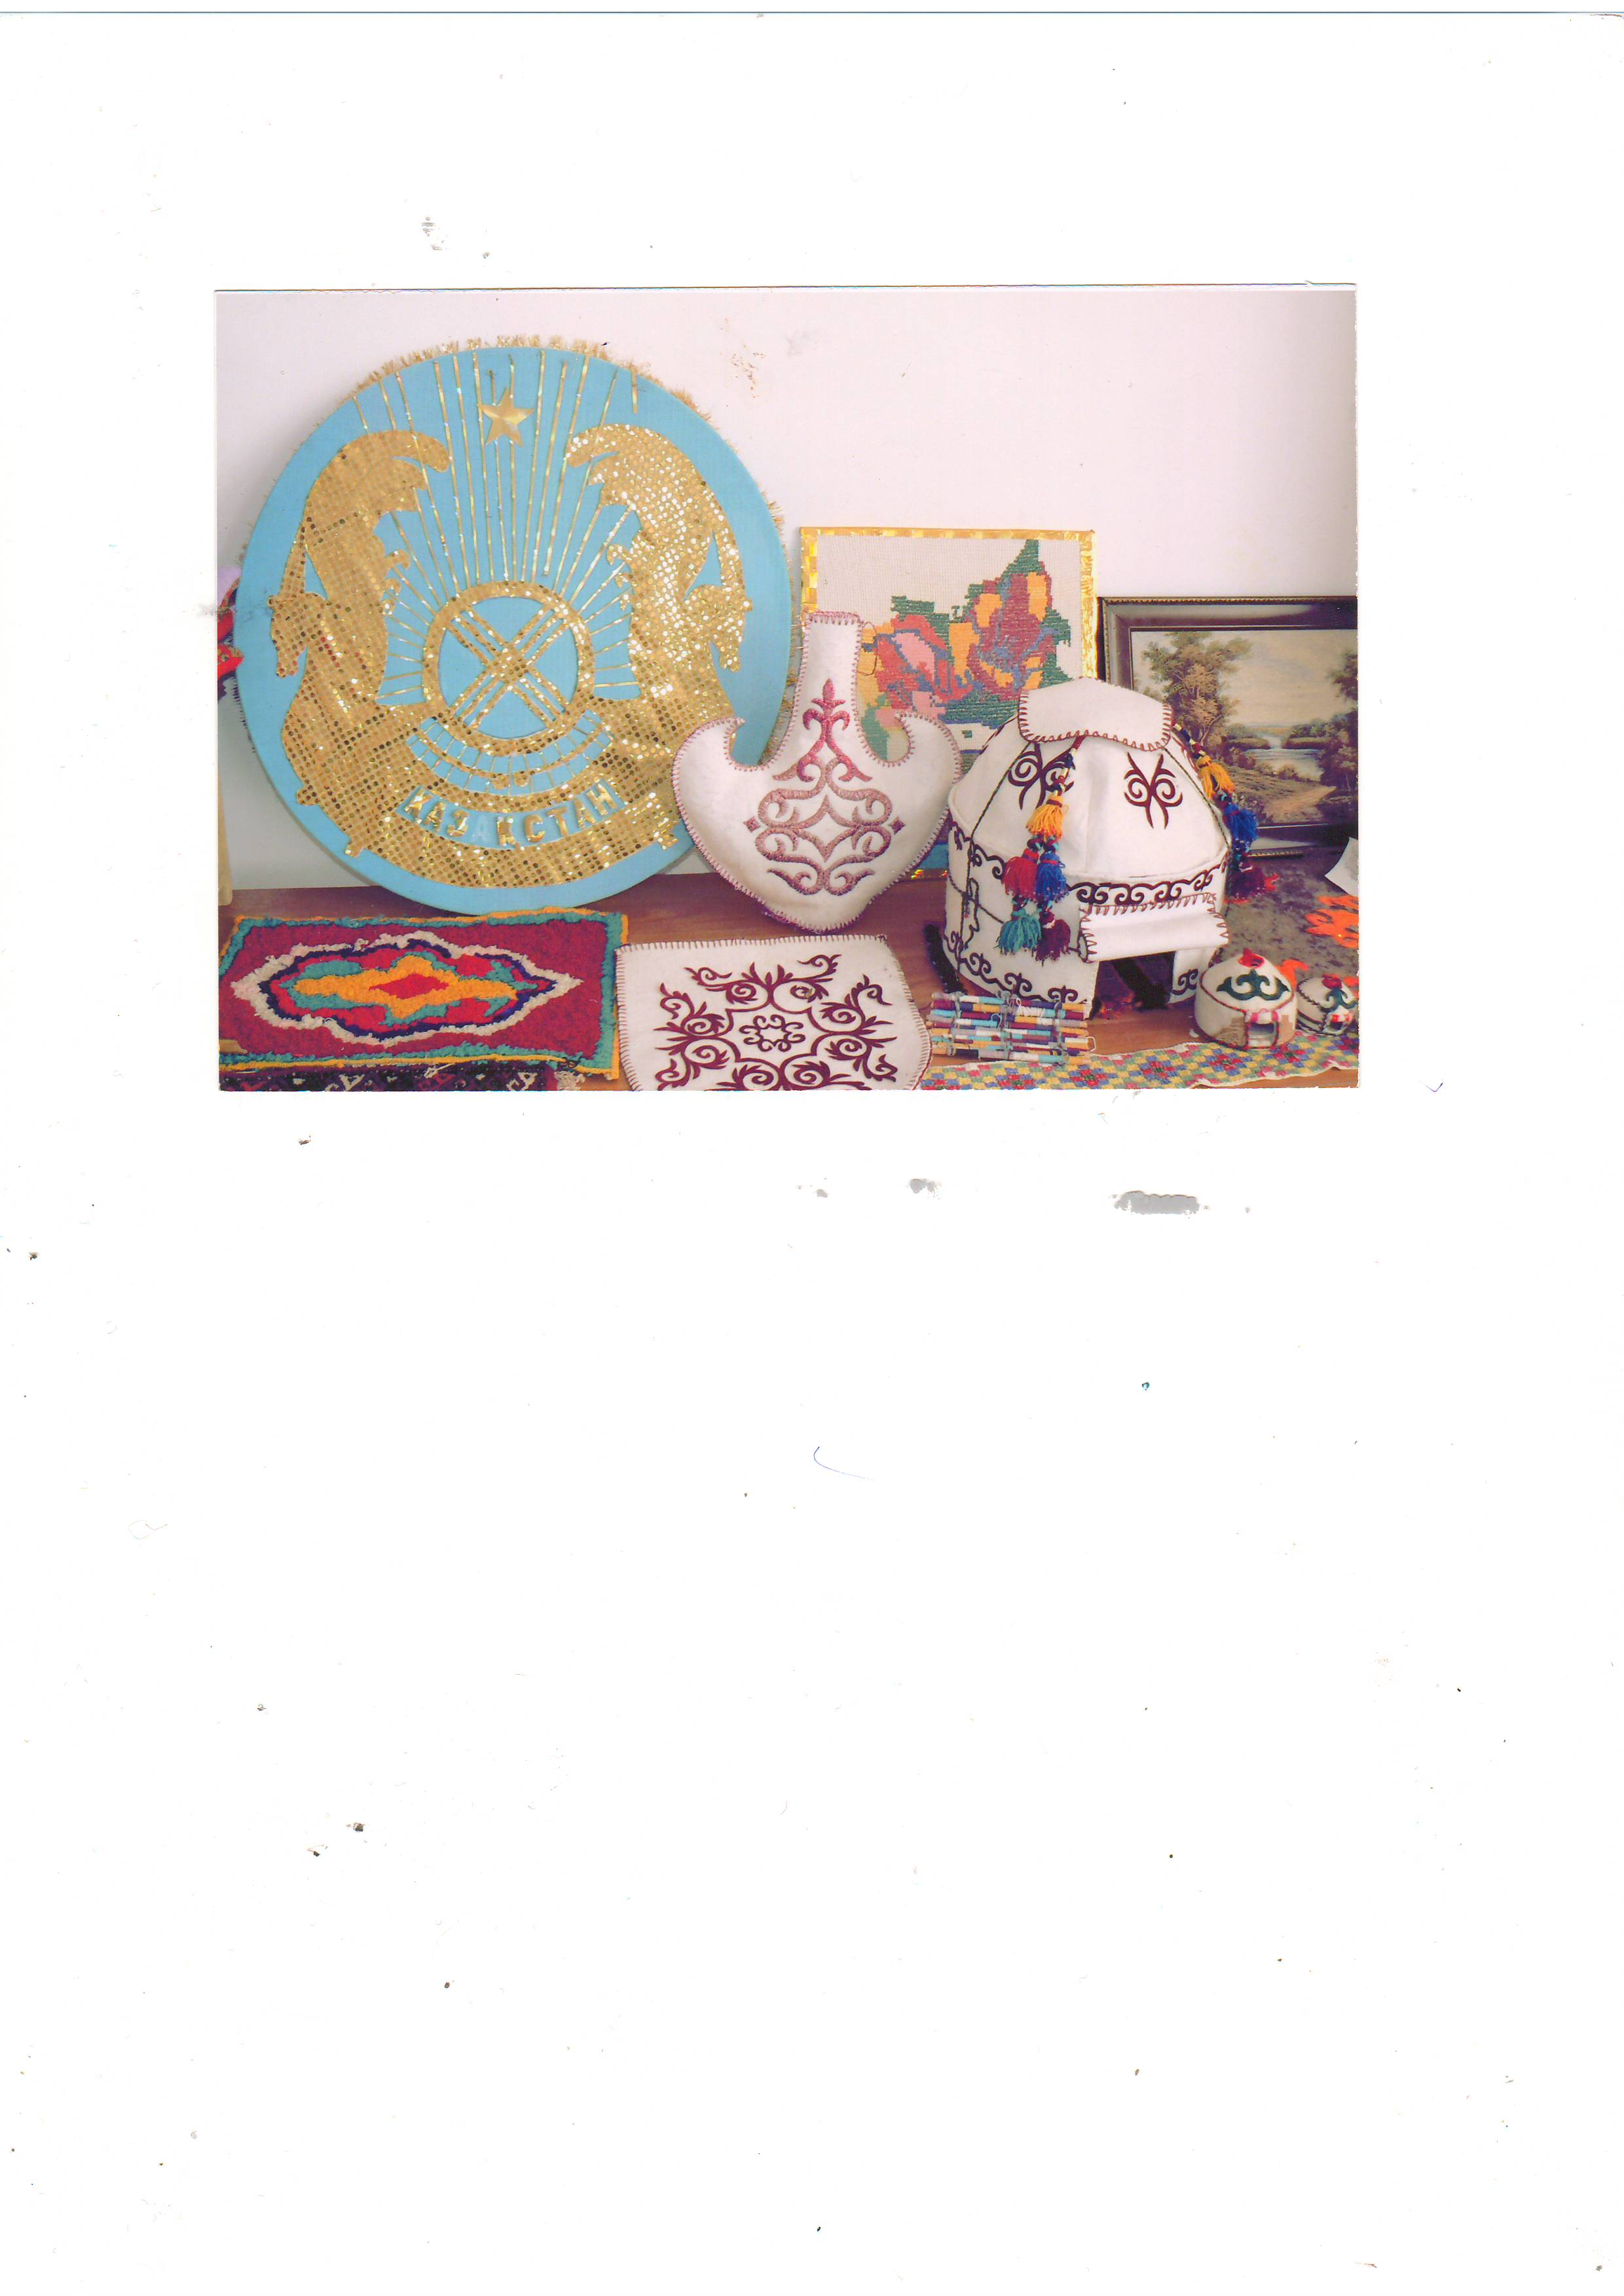 C:\Documents and Settings\Admin\Мои документы\Мои рисунки\2008-12-04\771600jjkjm0002.JPG